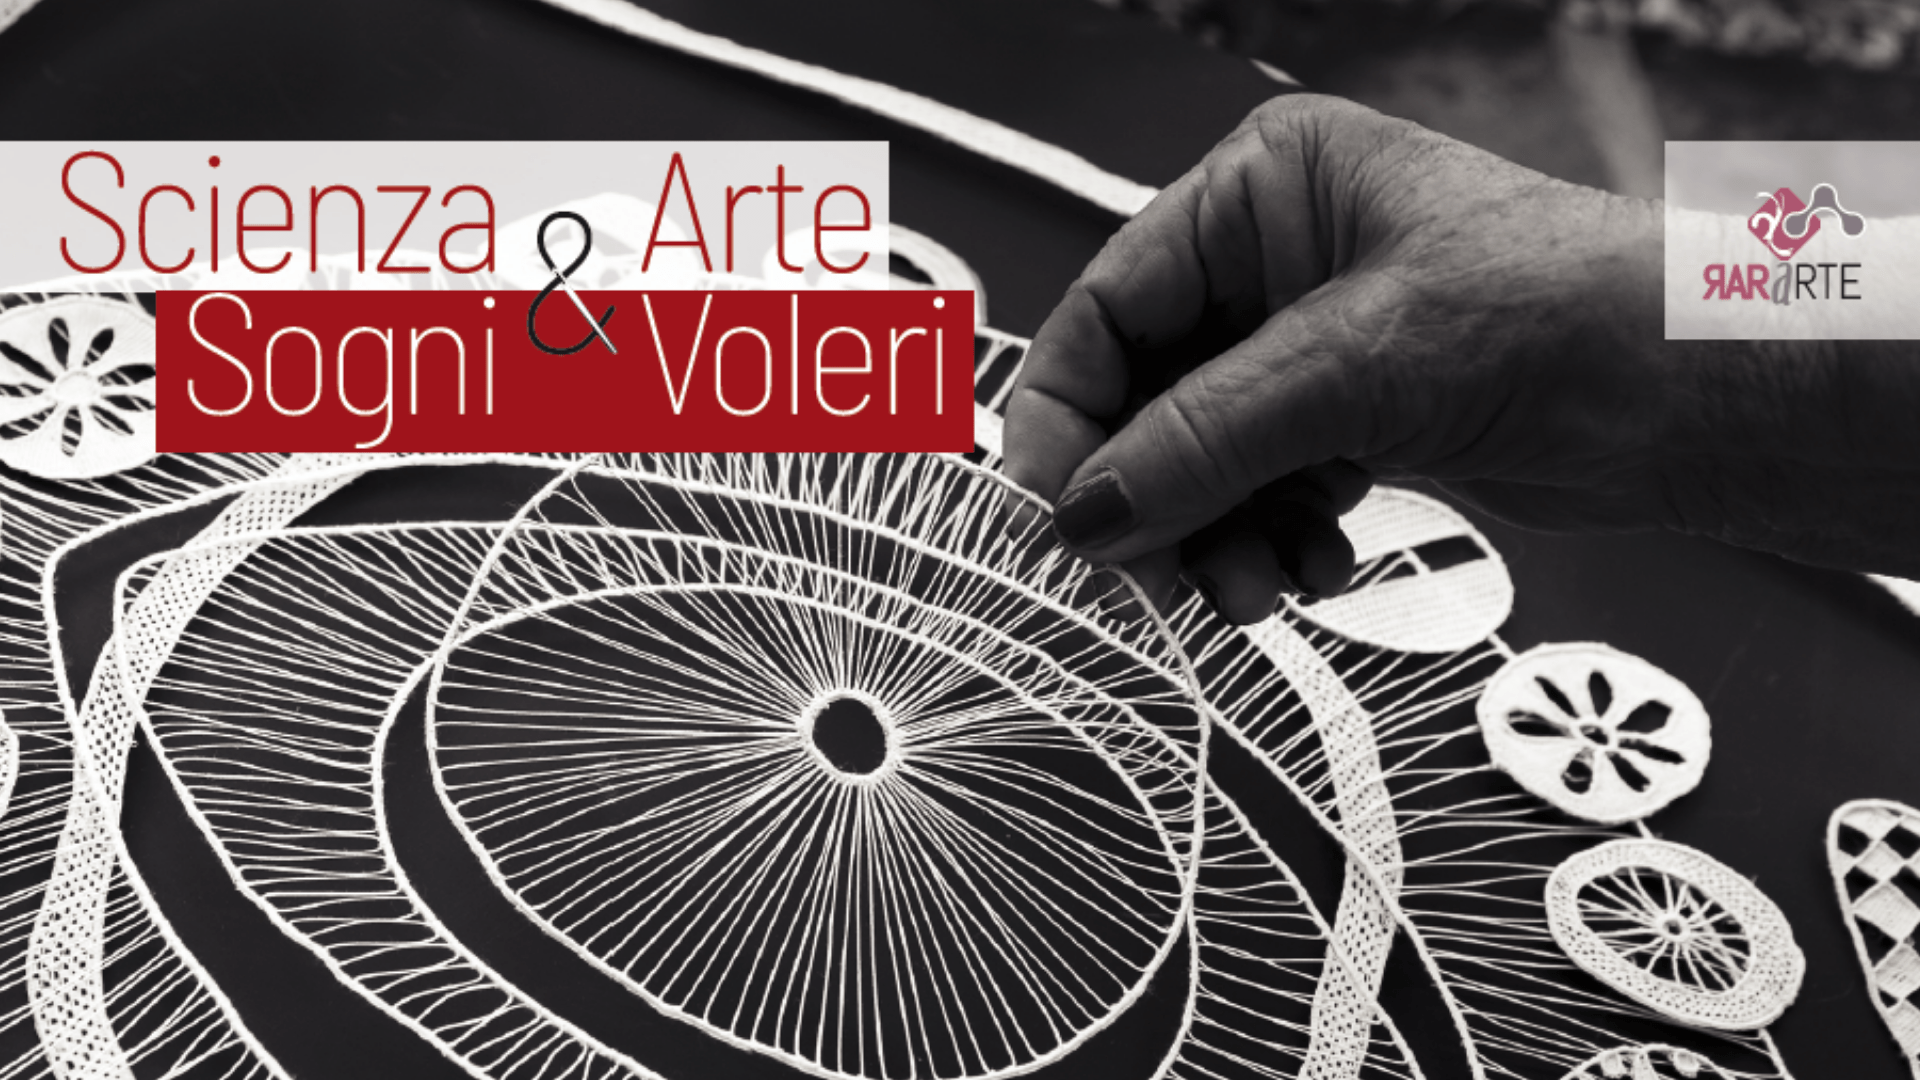 Scienze & Arte / Sogni & Voleri